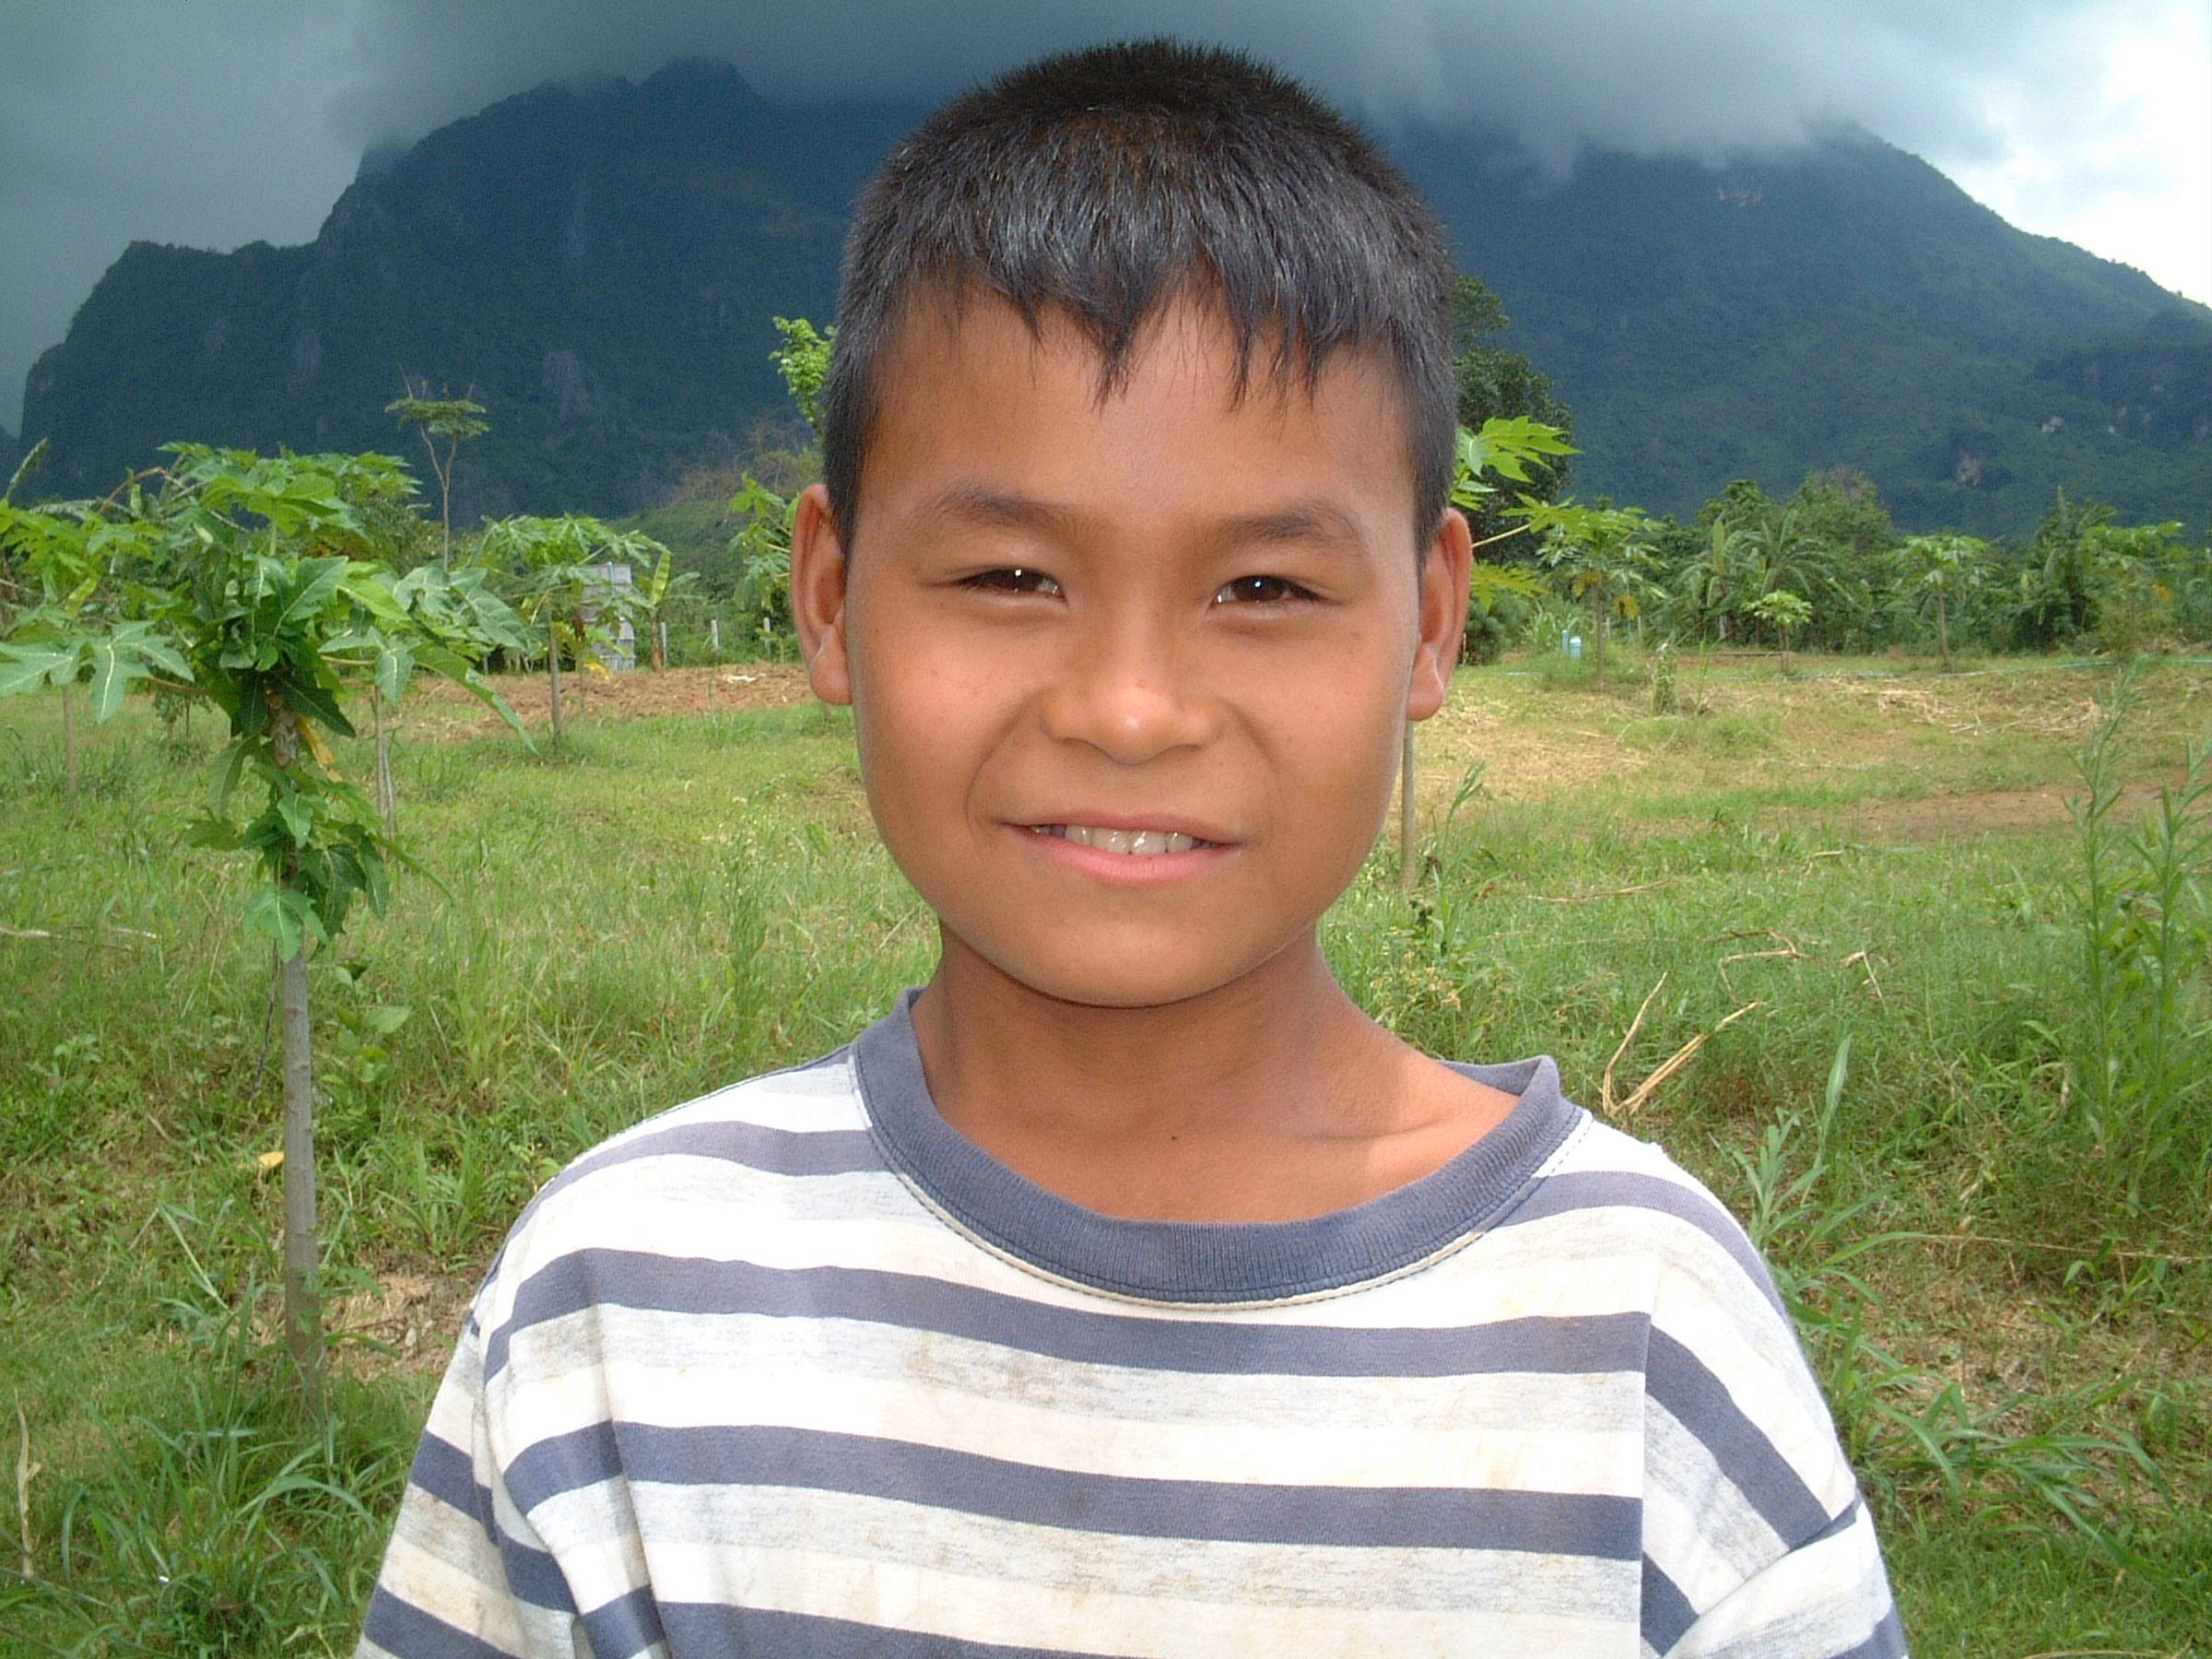 Boy with landscape